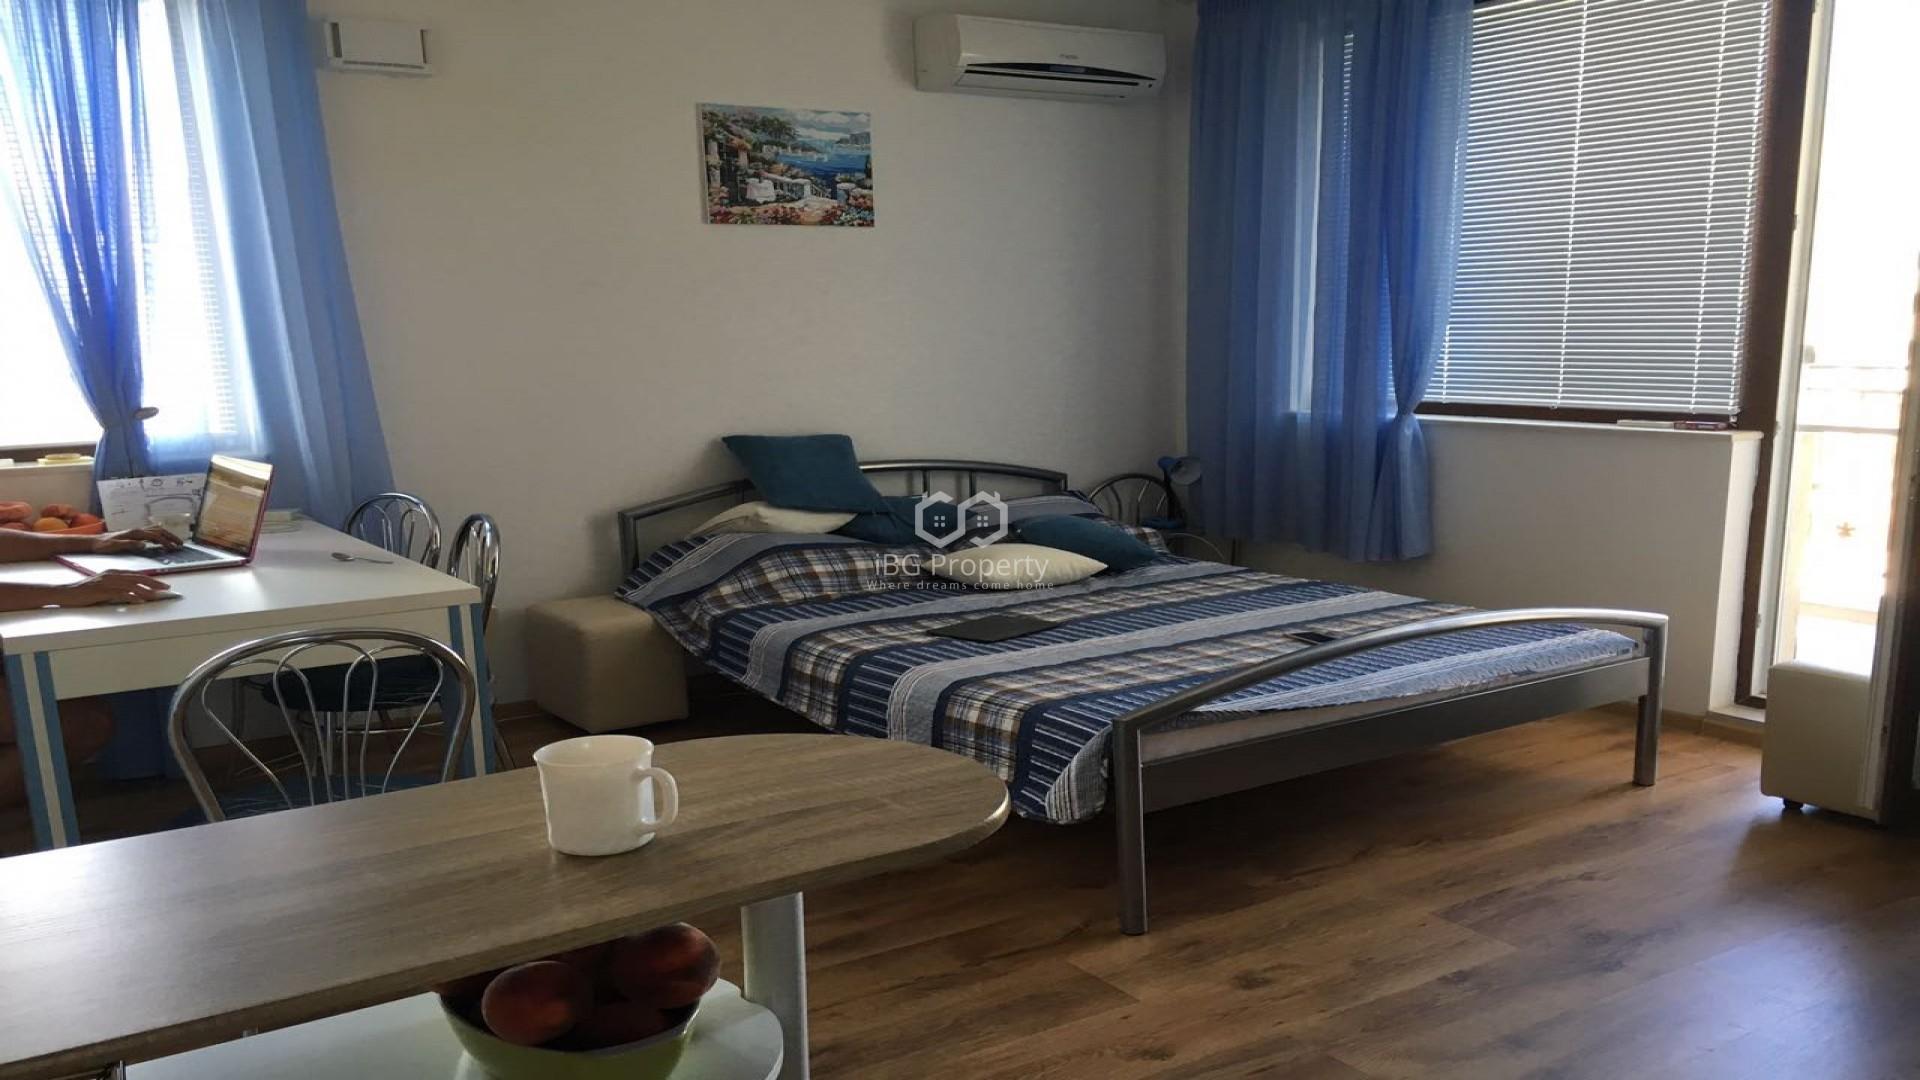 Однокомнатную квартира Бяла 41 m2